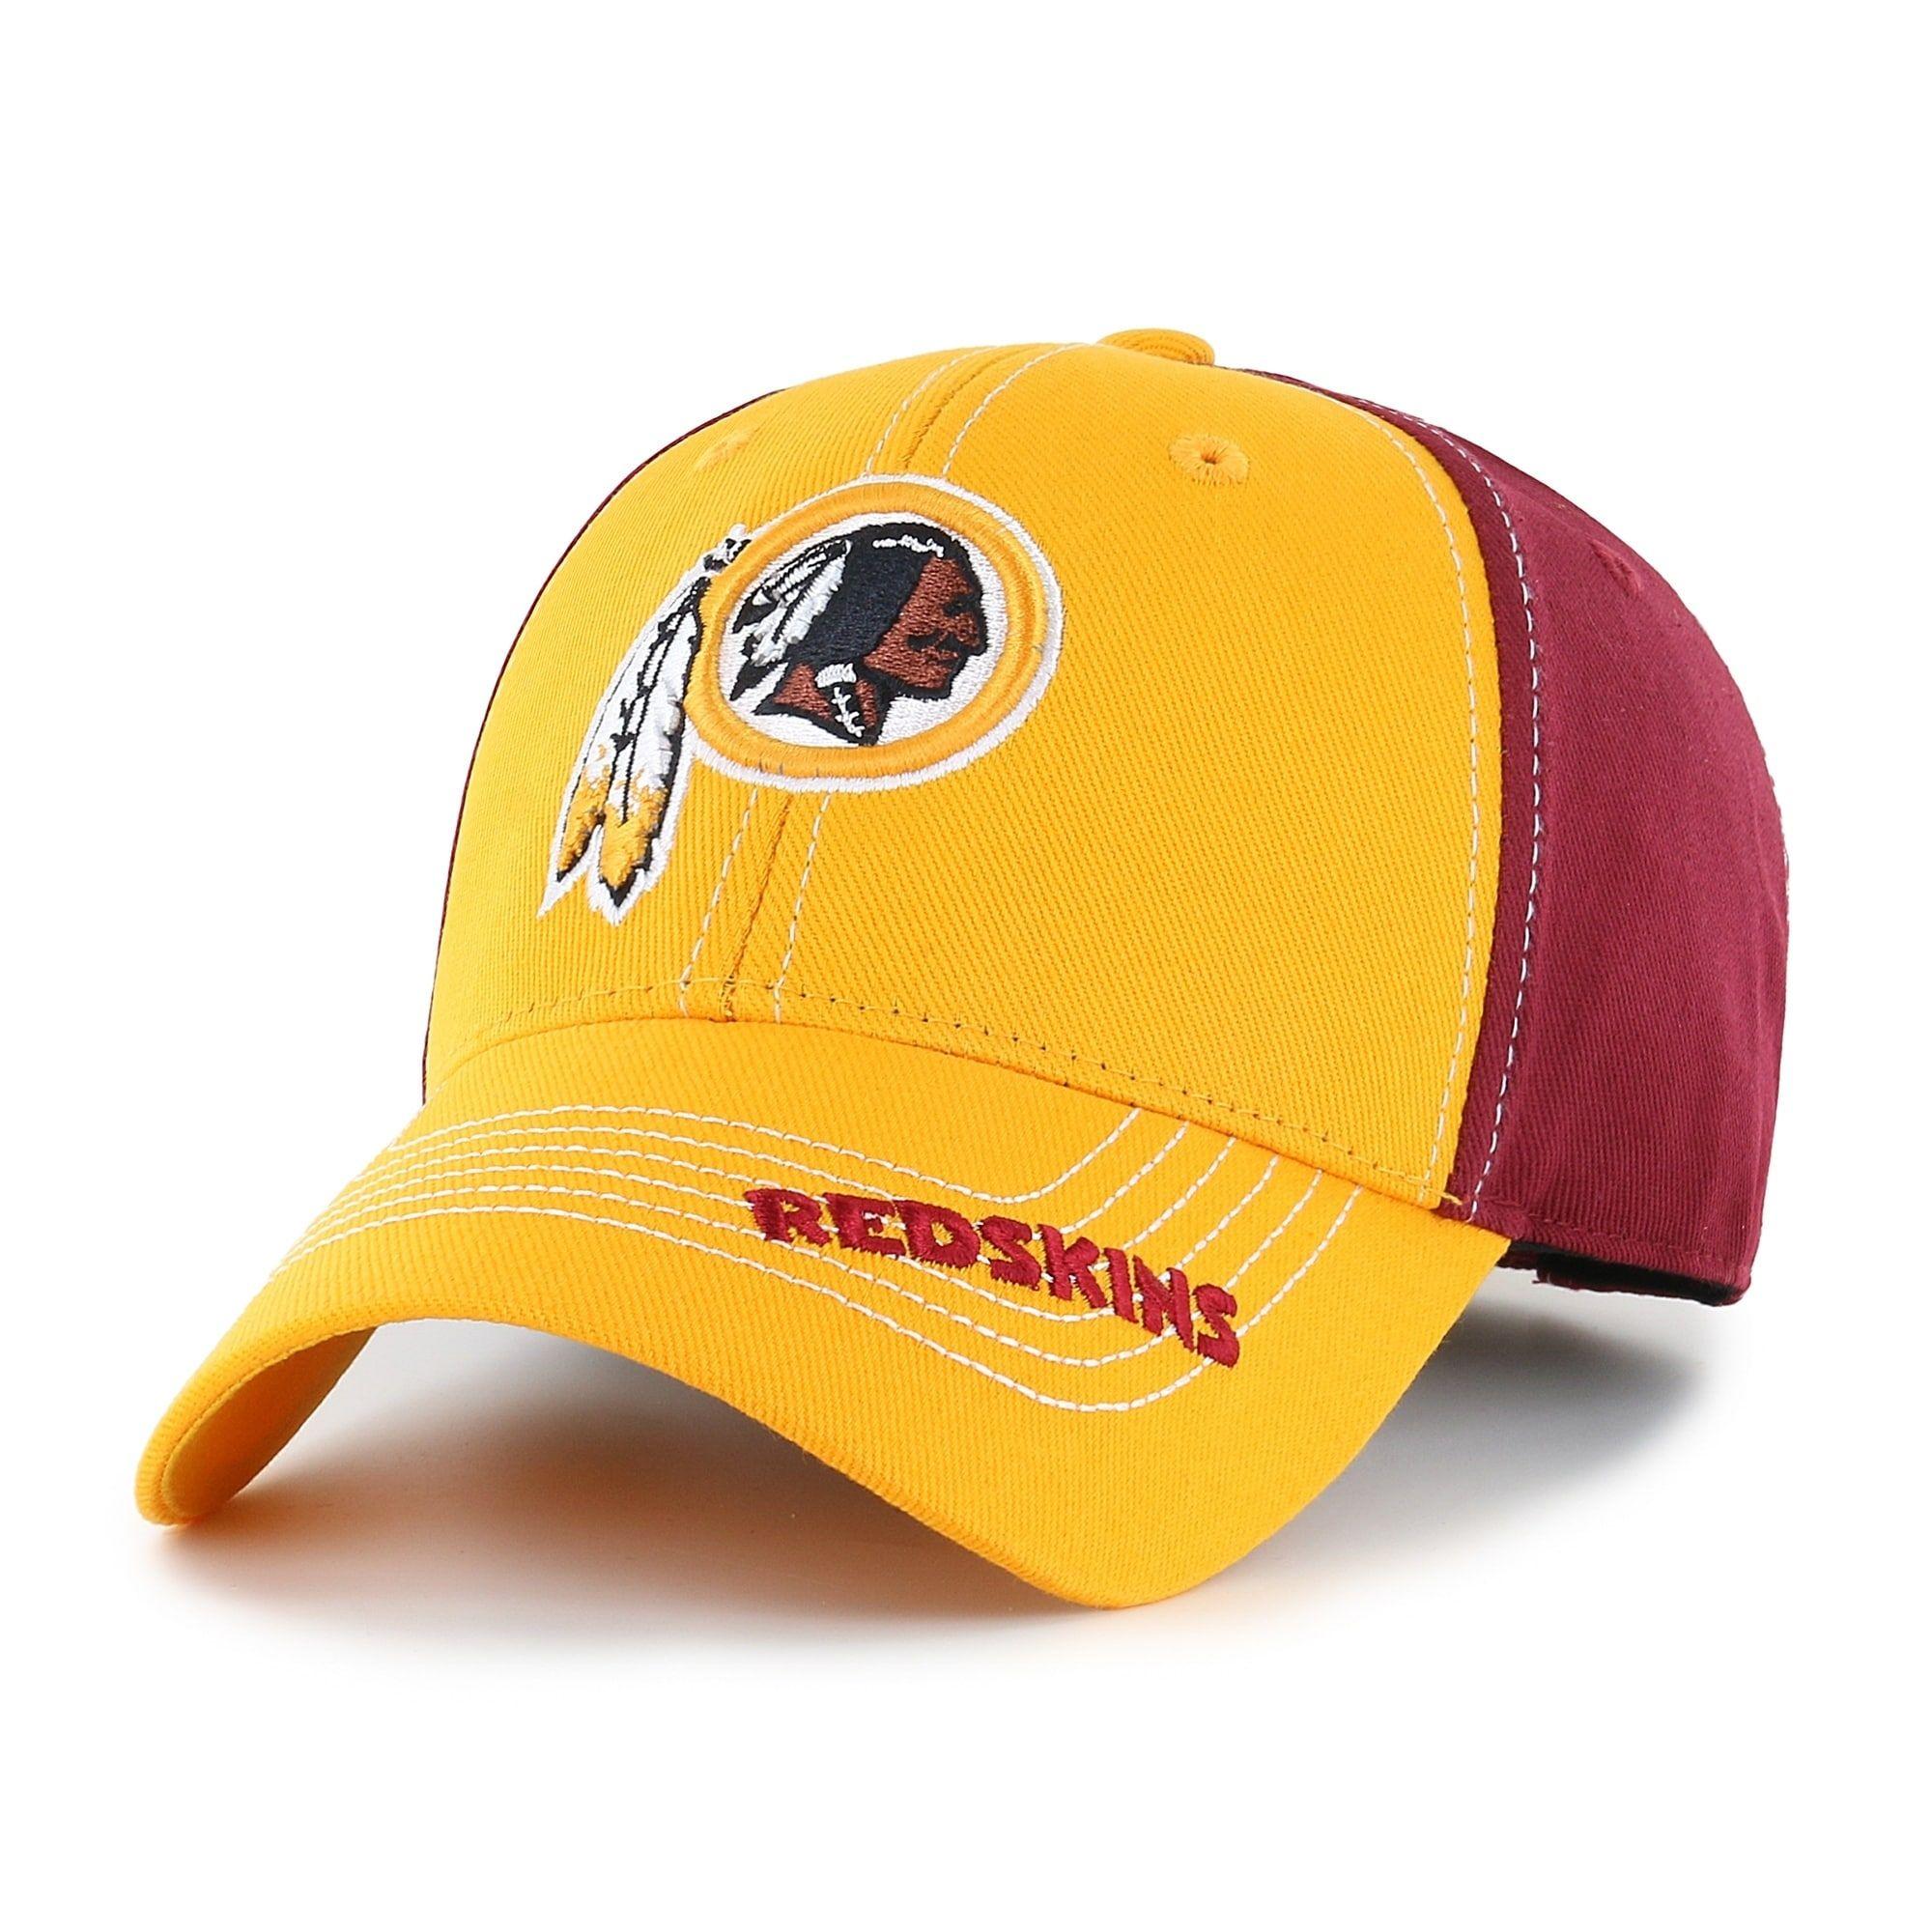 7ffa813c NFL Washington Redskins Revolver Adjustable Hat (Washington Redskins ...